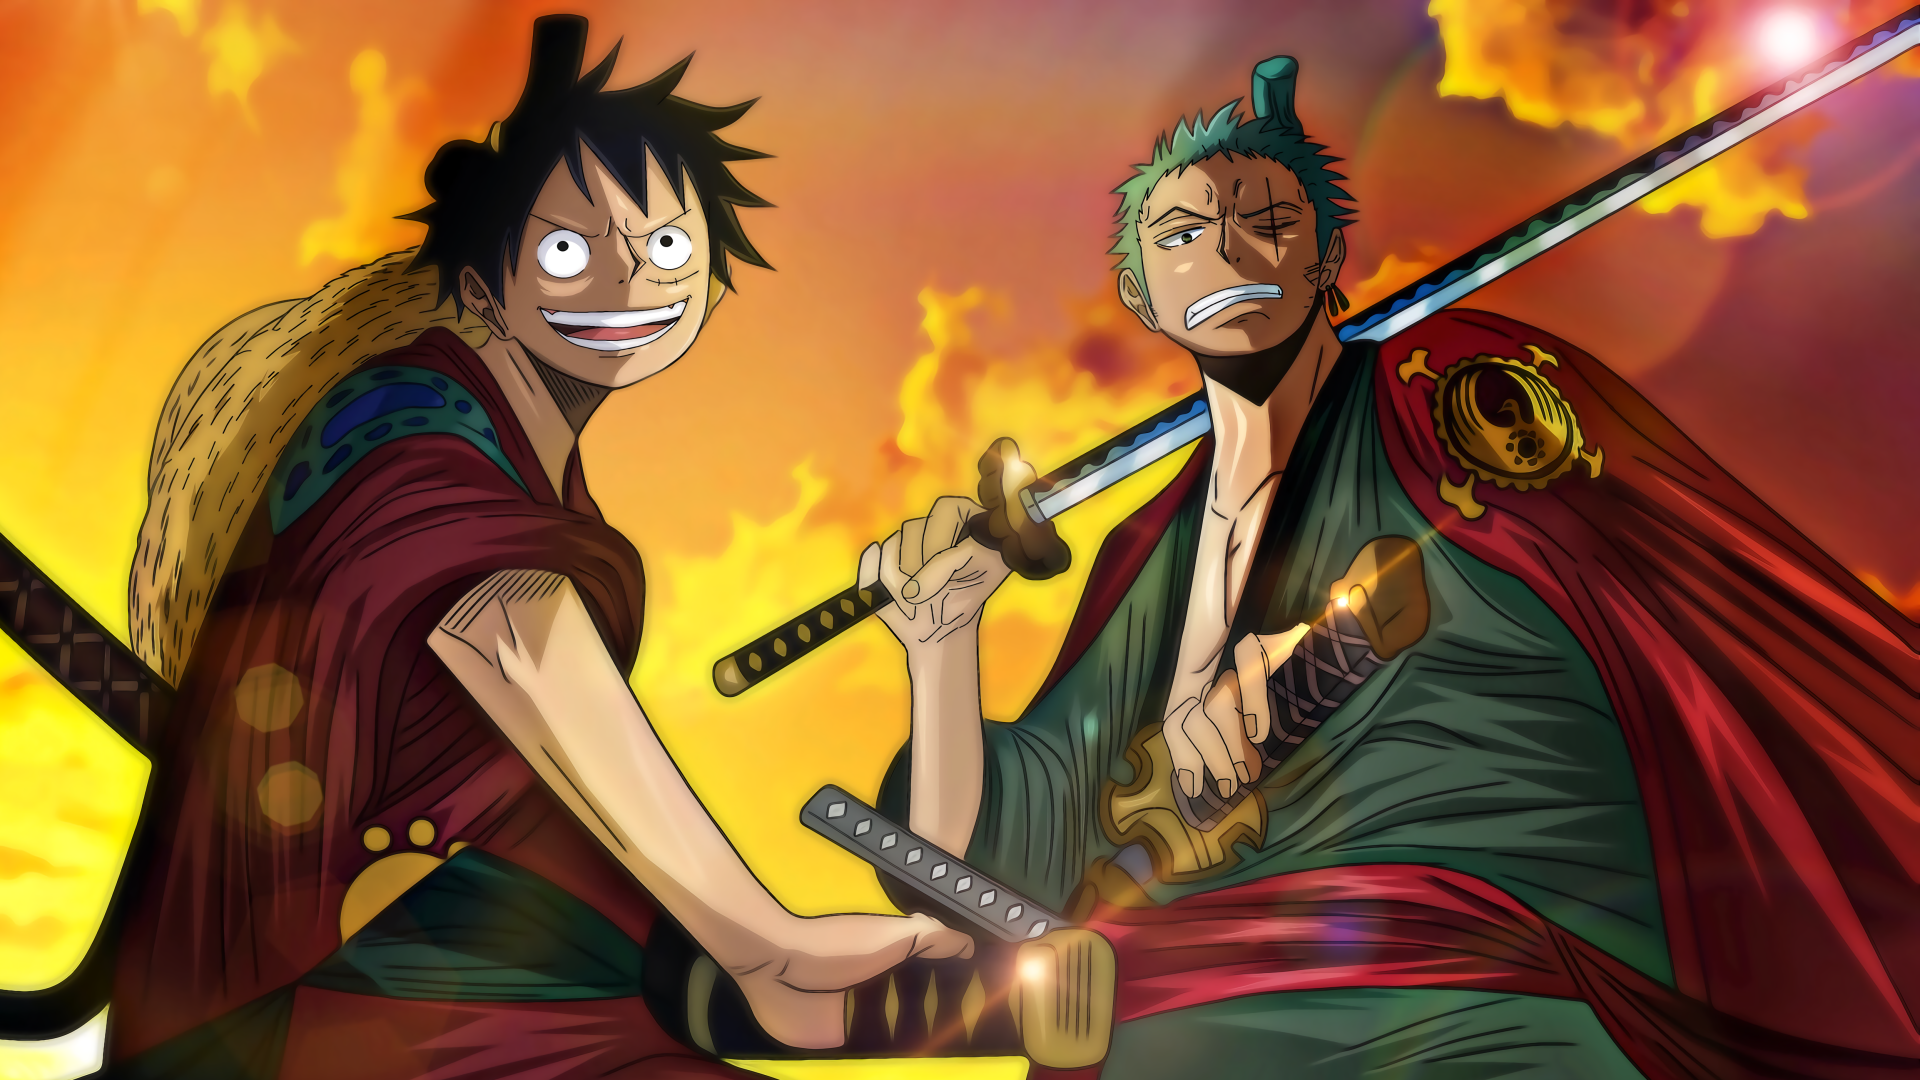 One Piece Batch Lengkap Terupdate Anime One Roronoa Zoro Zoro One Piece